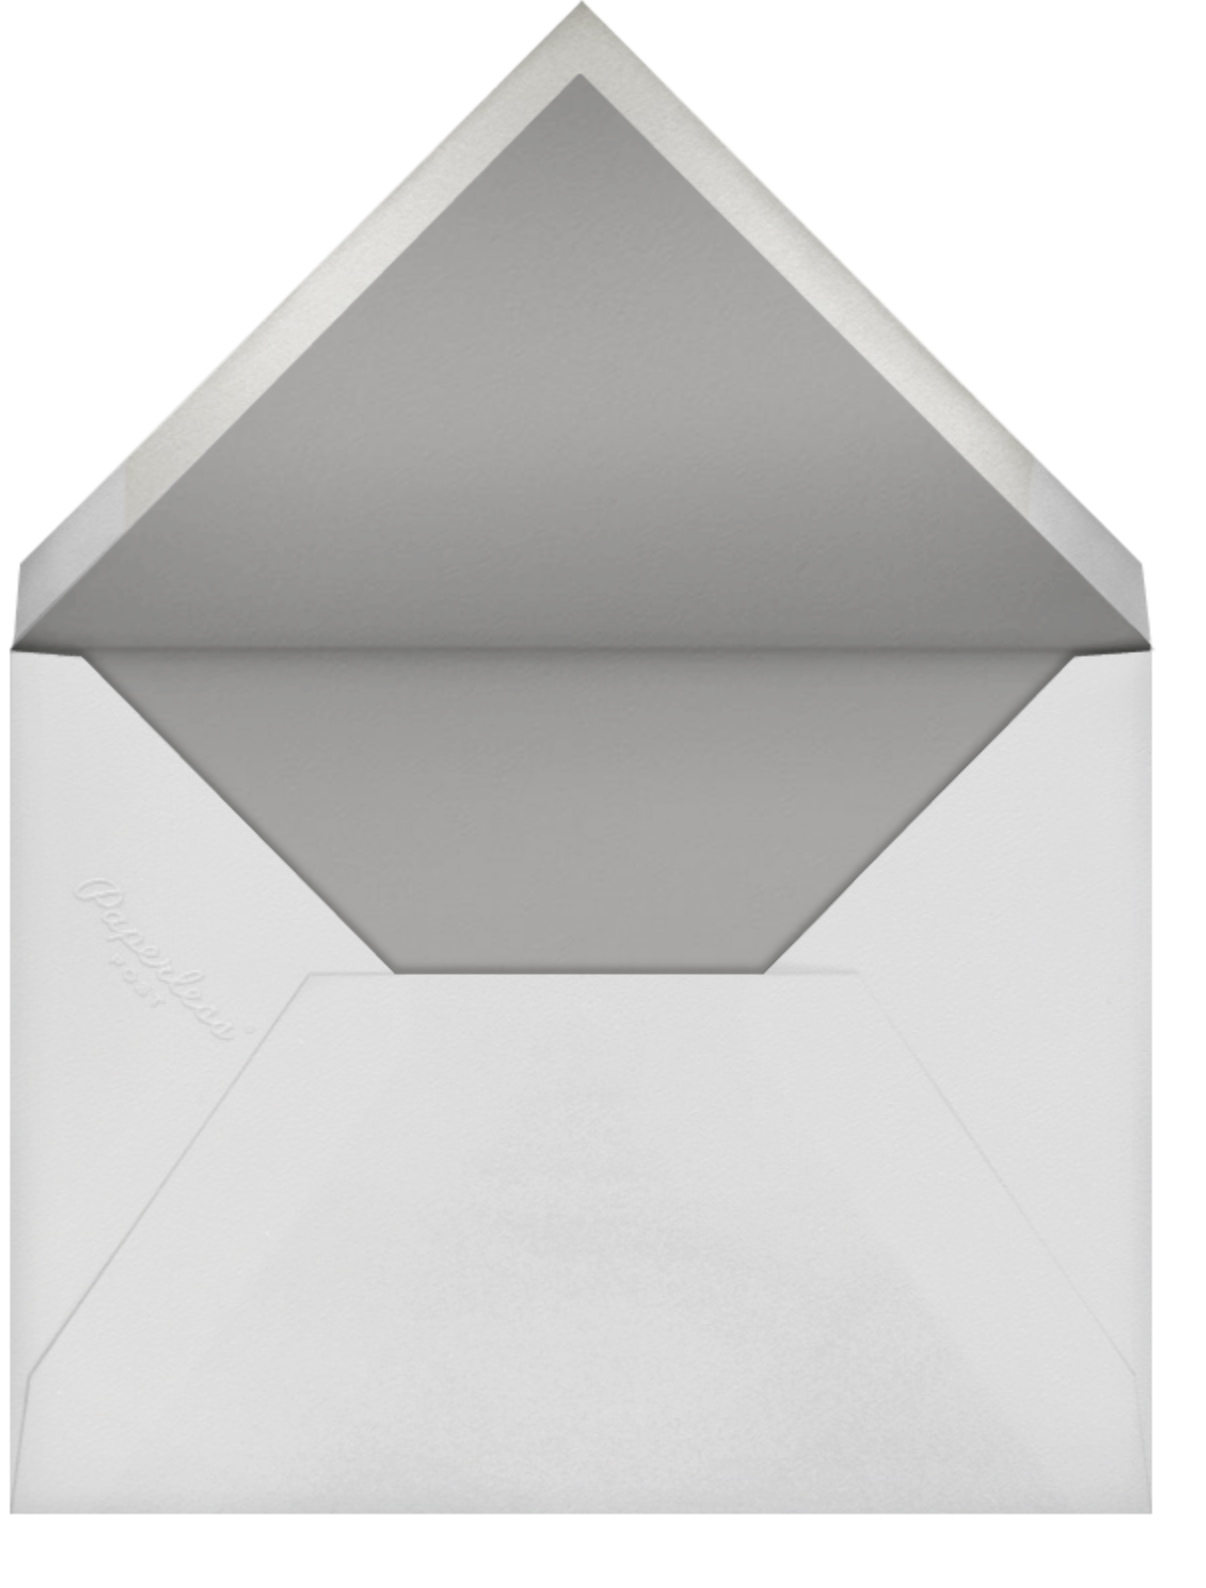 Pearl Embroidery (Square) - Silver - Oscar de la Renta - Engagement party - envelope back